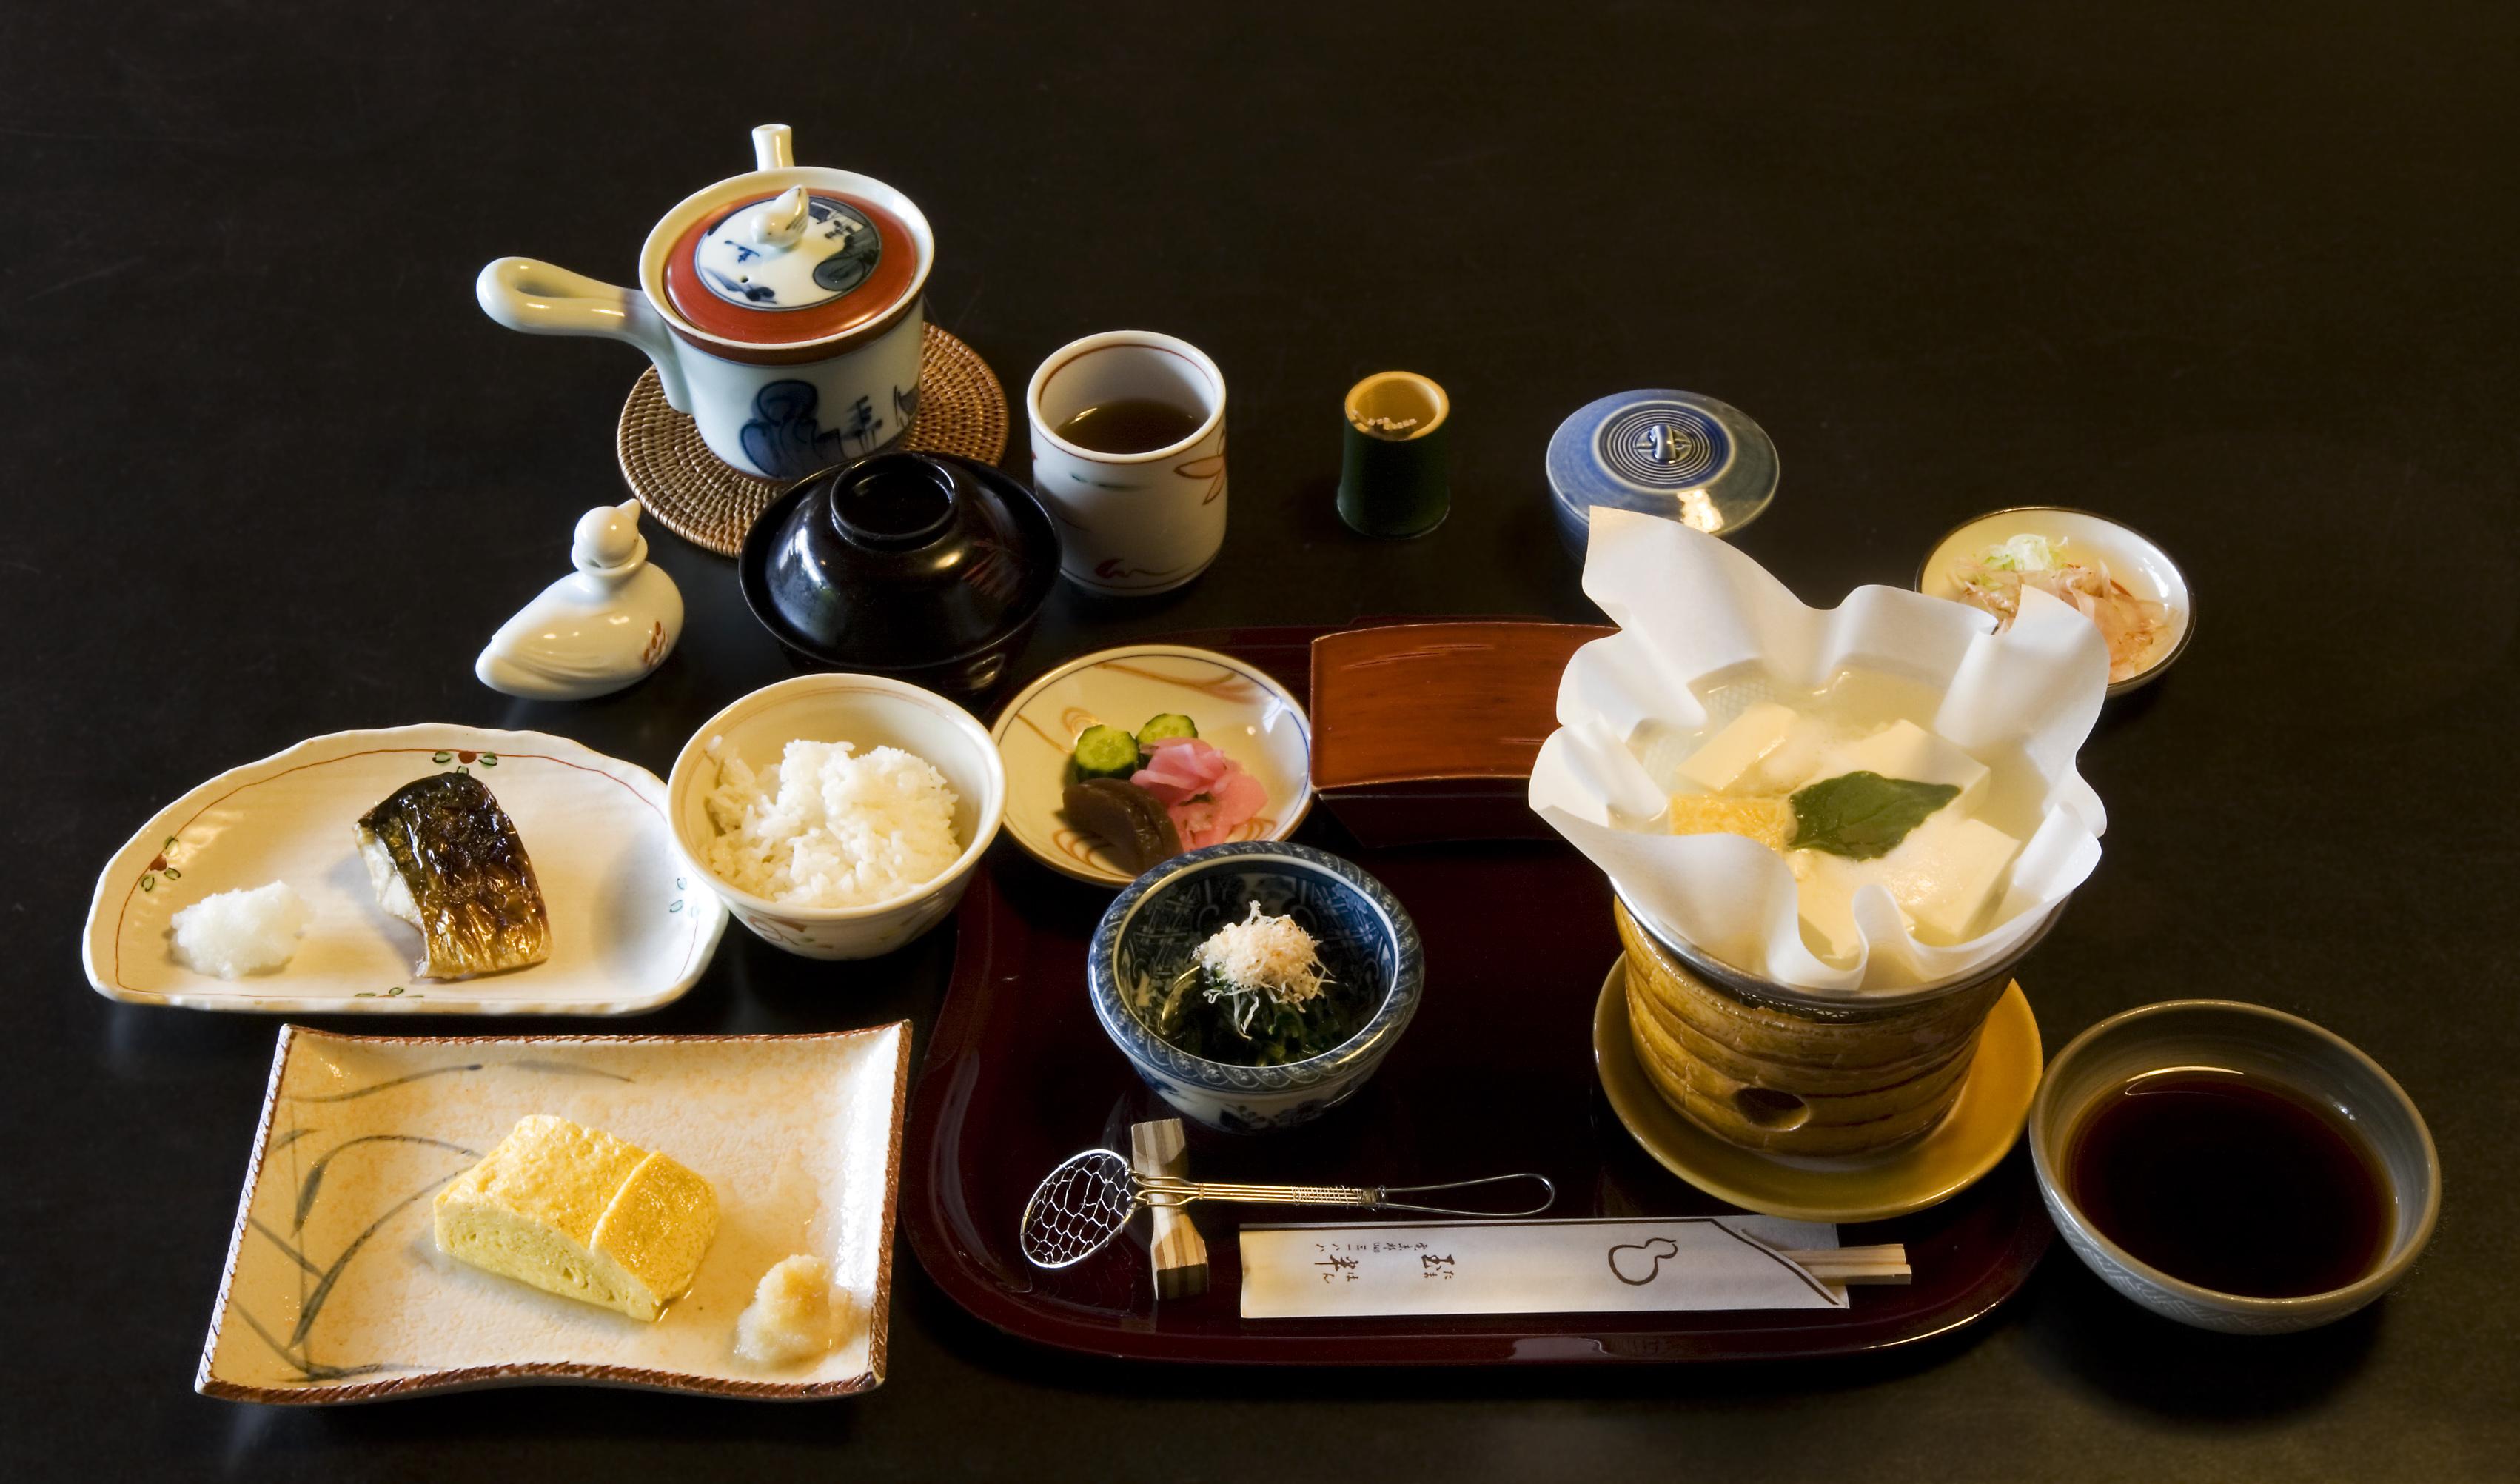 ingredienti del tè dieta california